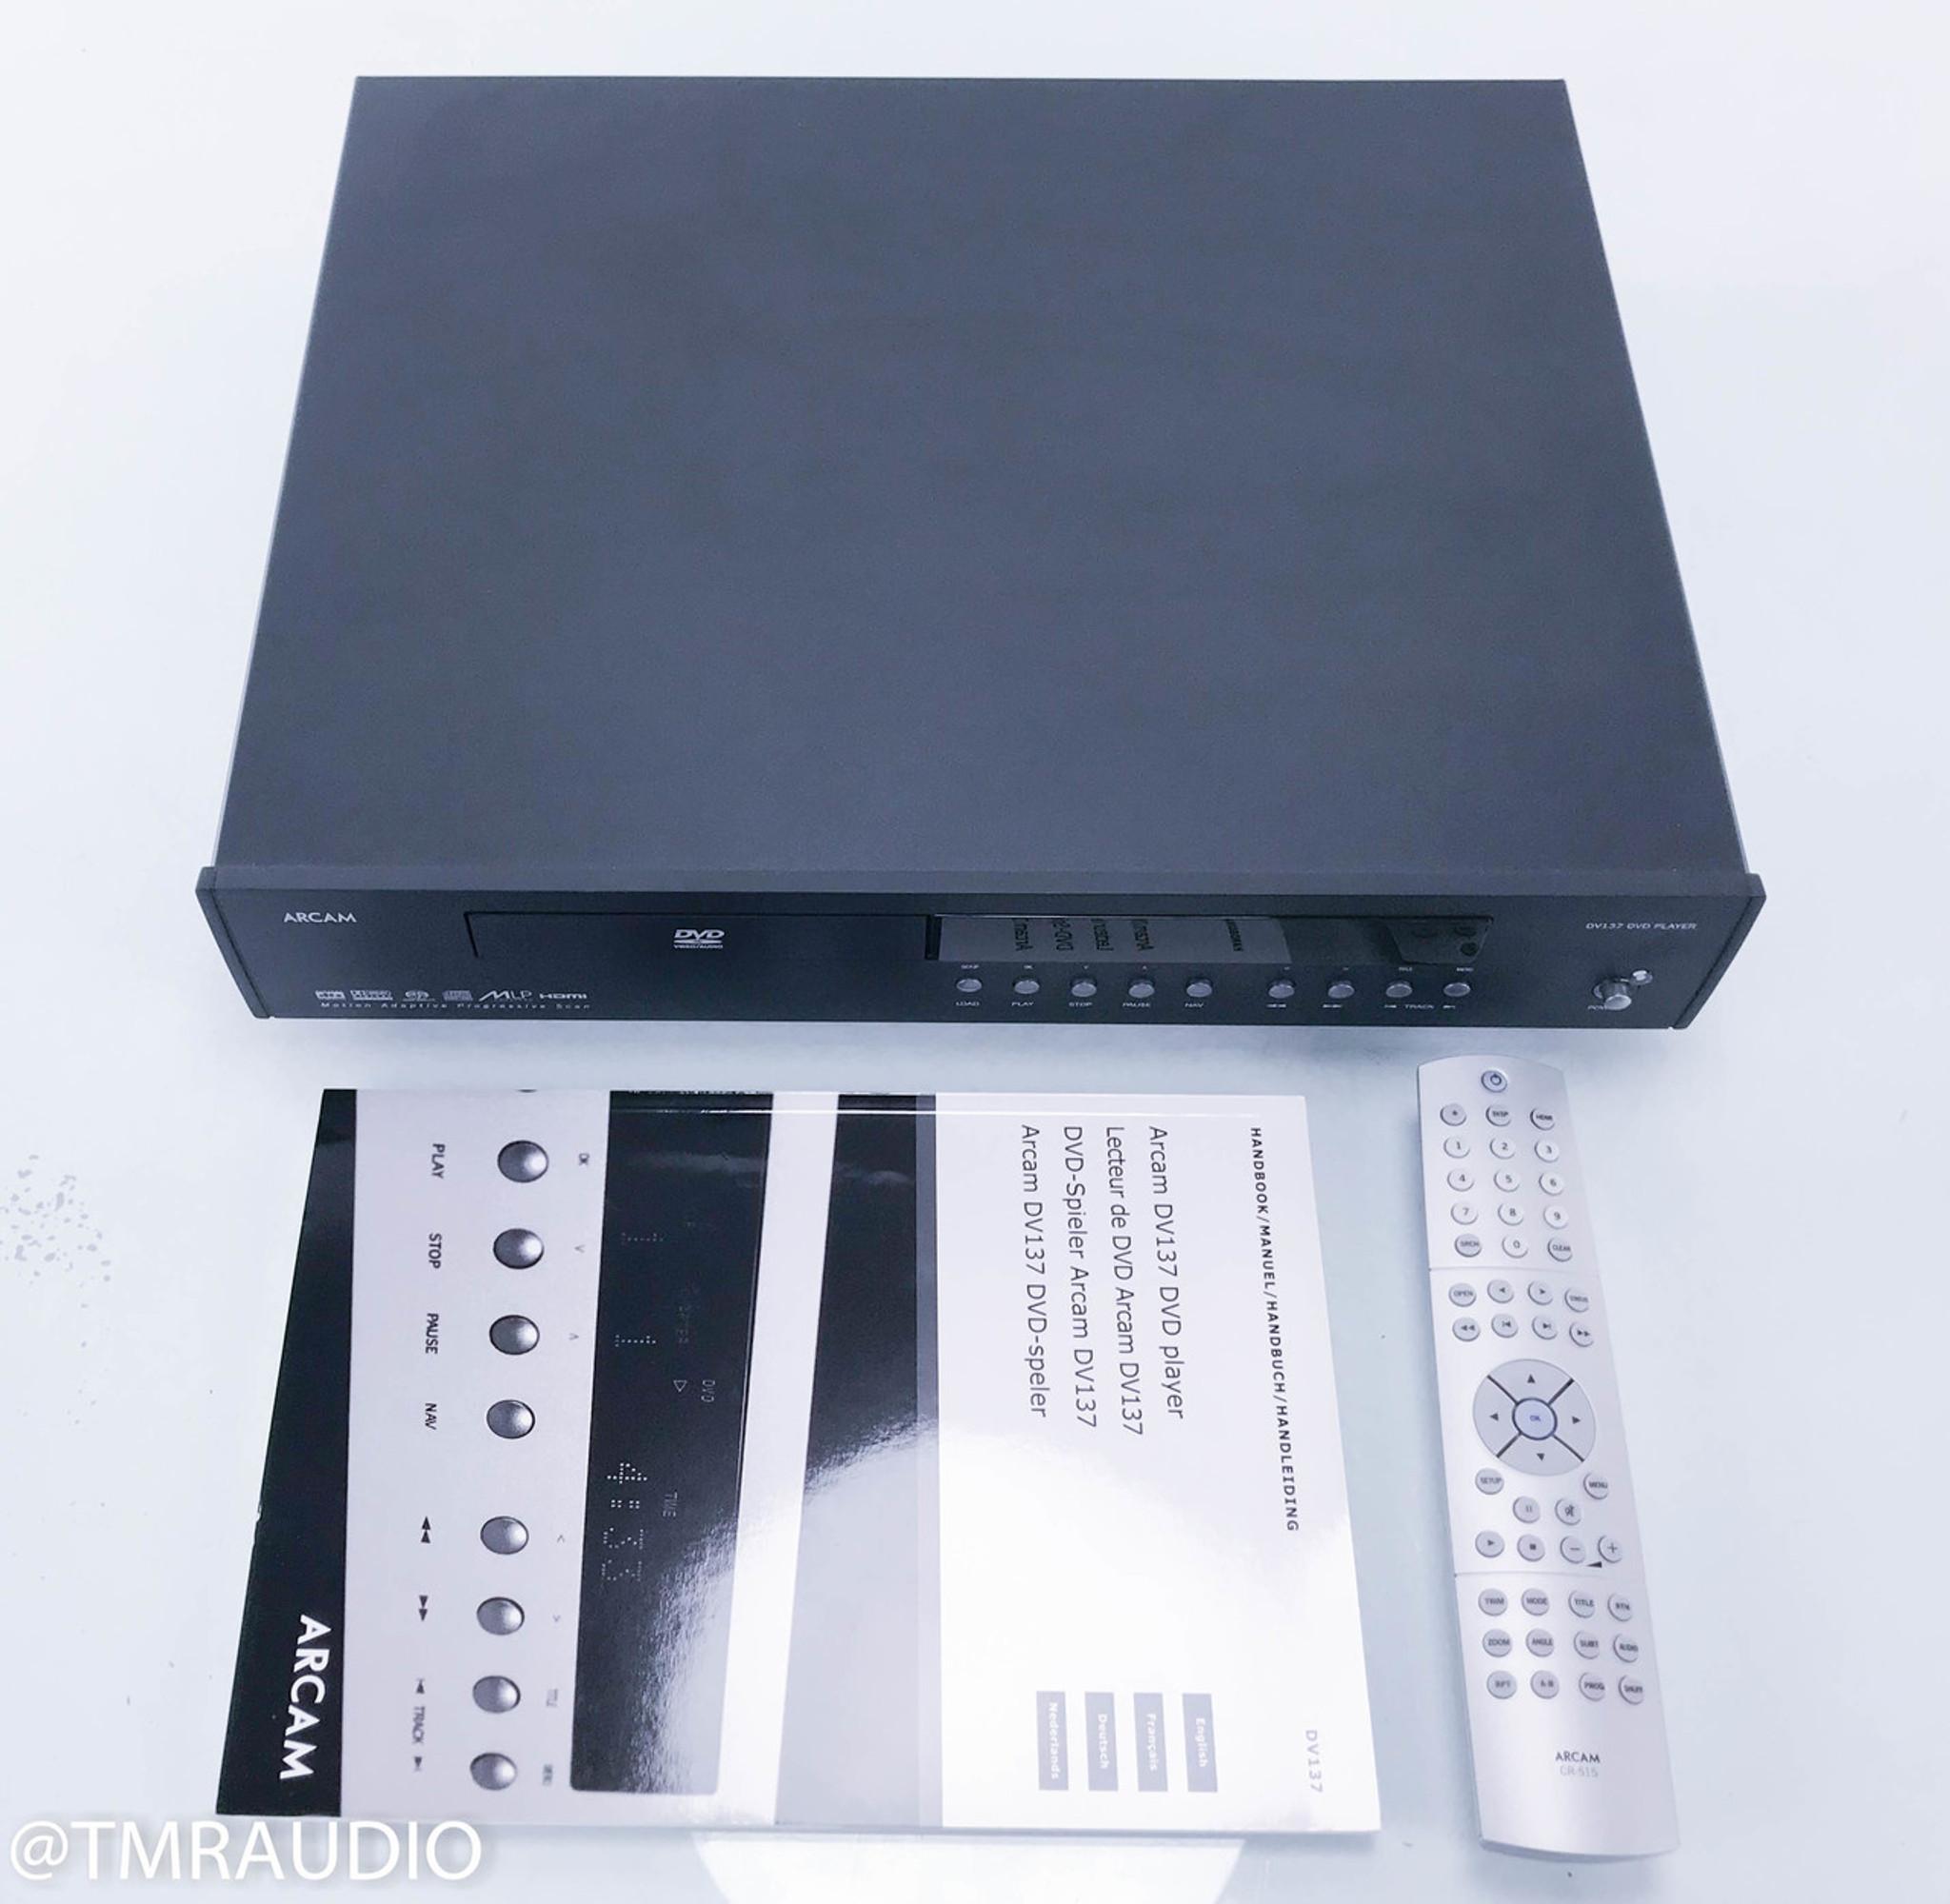 arcam dv137 dvd cd sacd player the music room rh tmraudio com